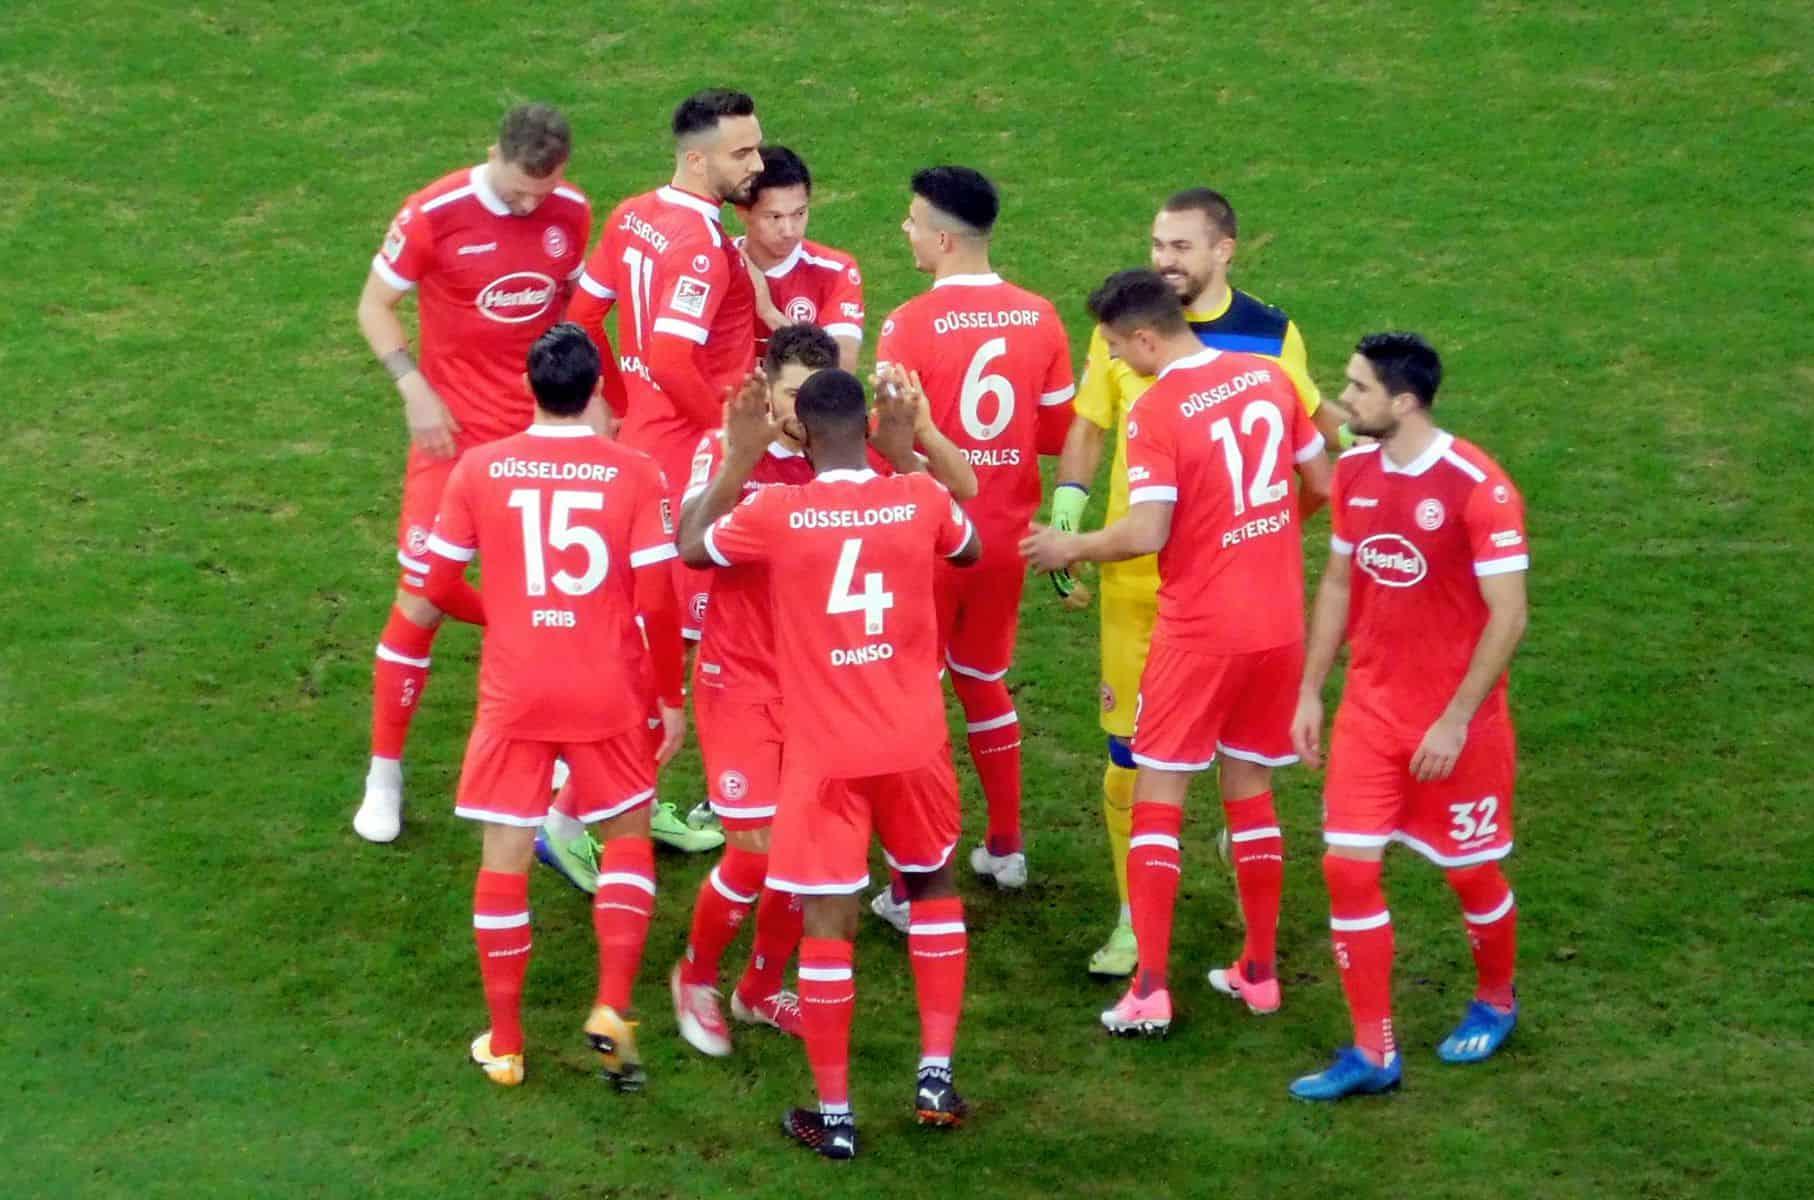 F95 vs Paderborn: Die Stimmung stimmt im Rudel